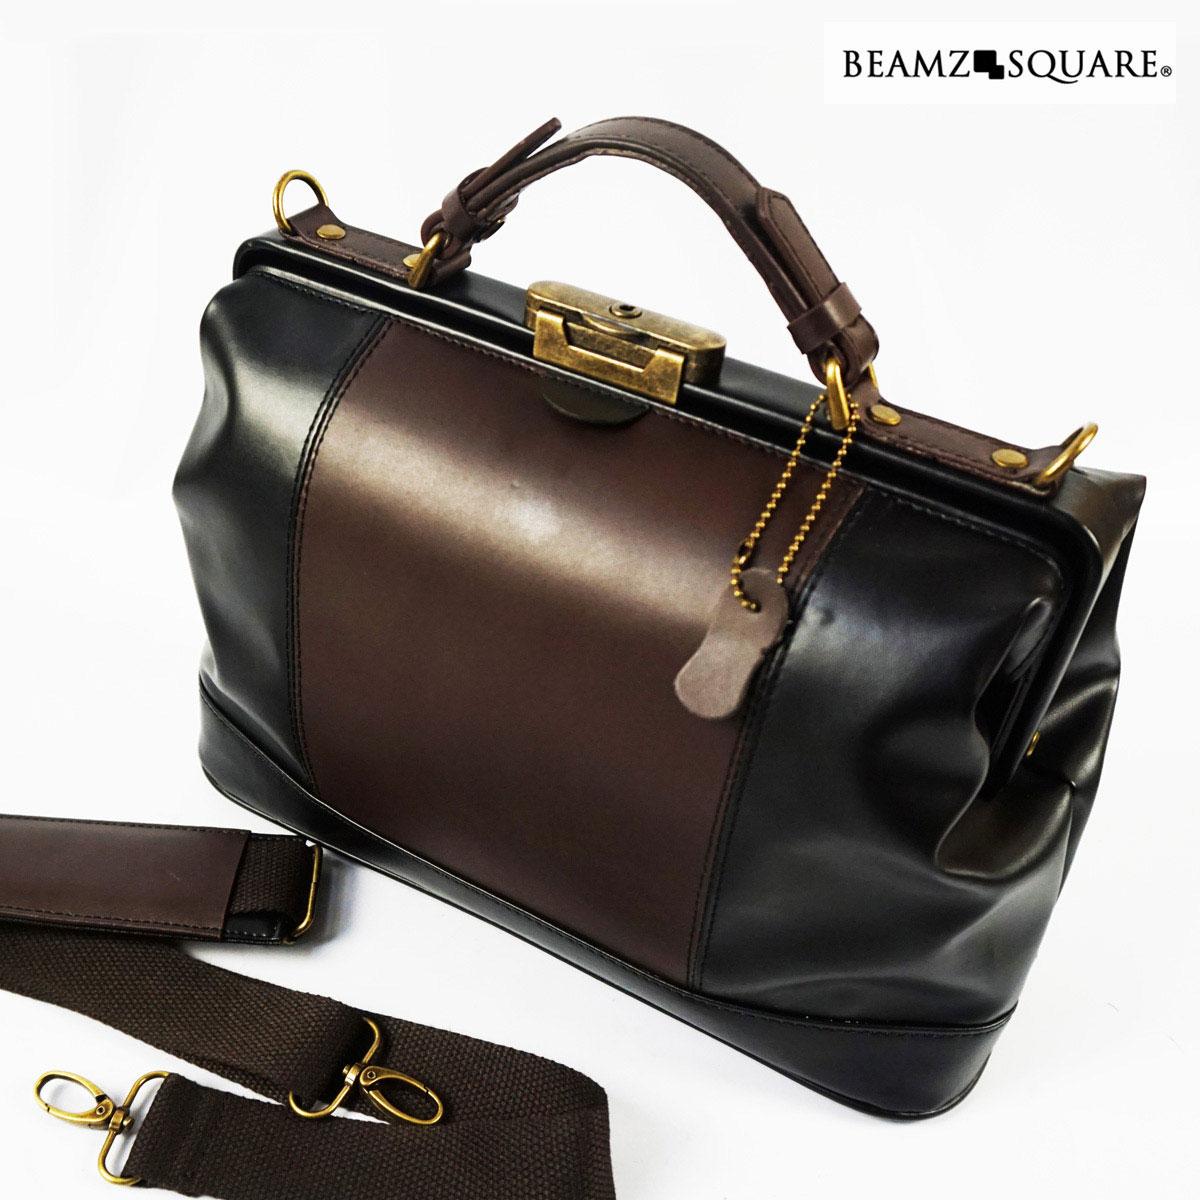 BEAMZSQUARE 牛革ダレスバッグ BK/DBR bs-2441